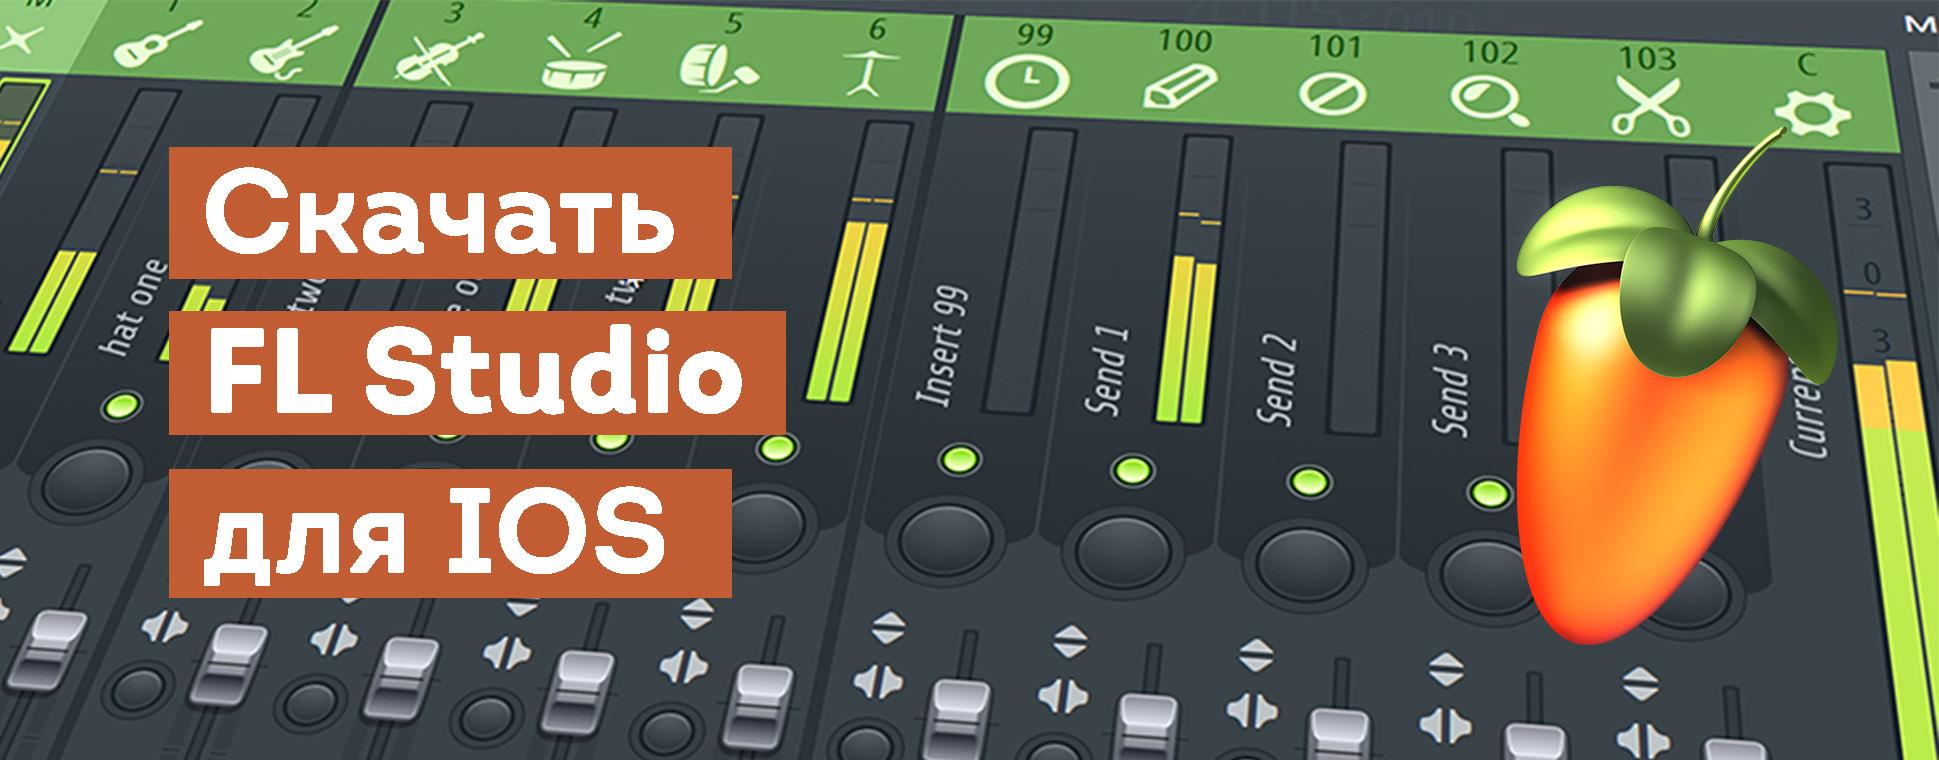 FL Studio (ФЛ Студио) Для iOS